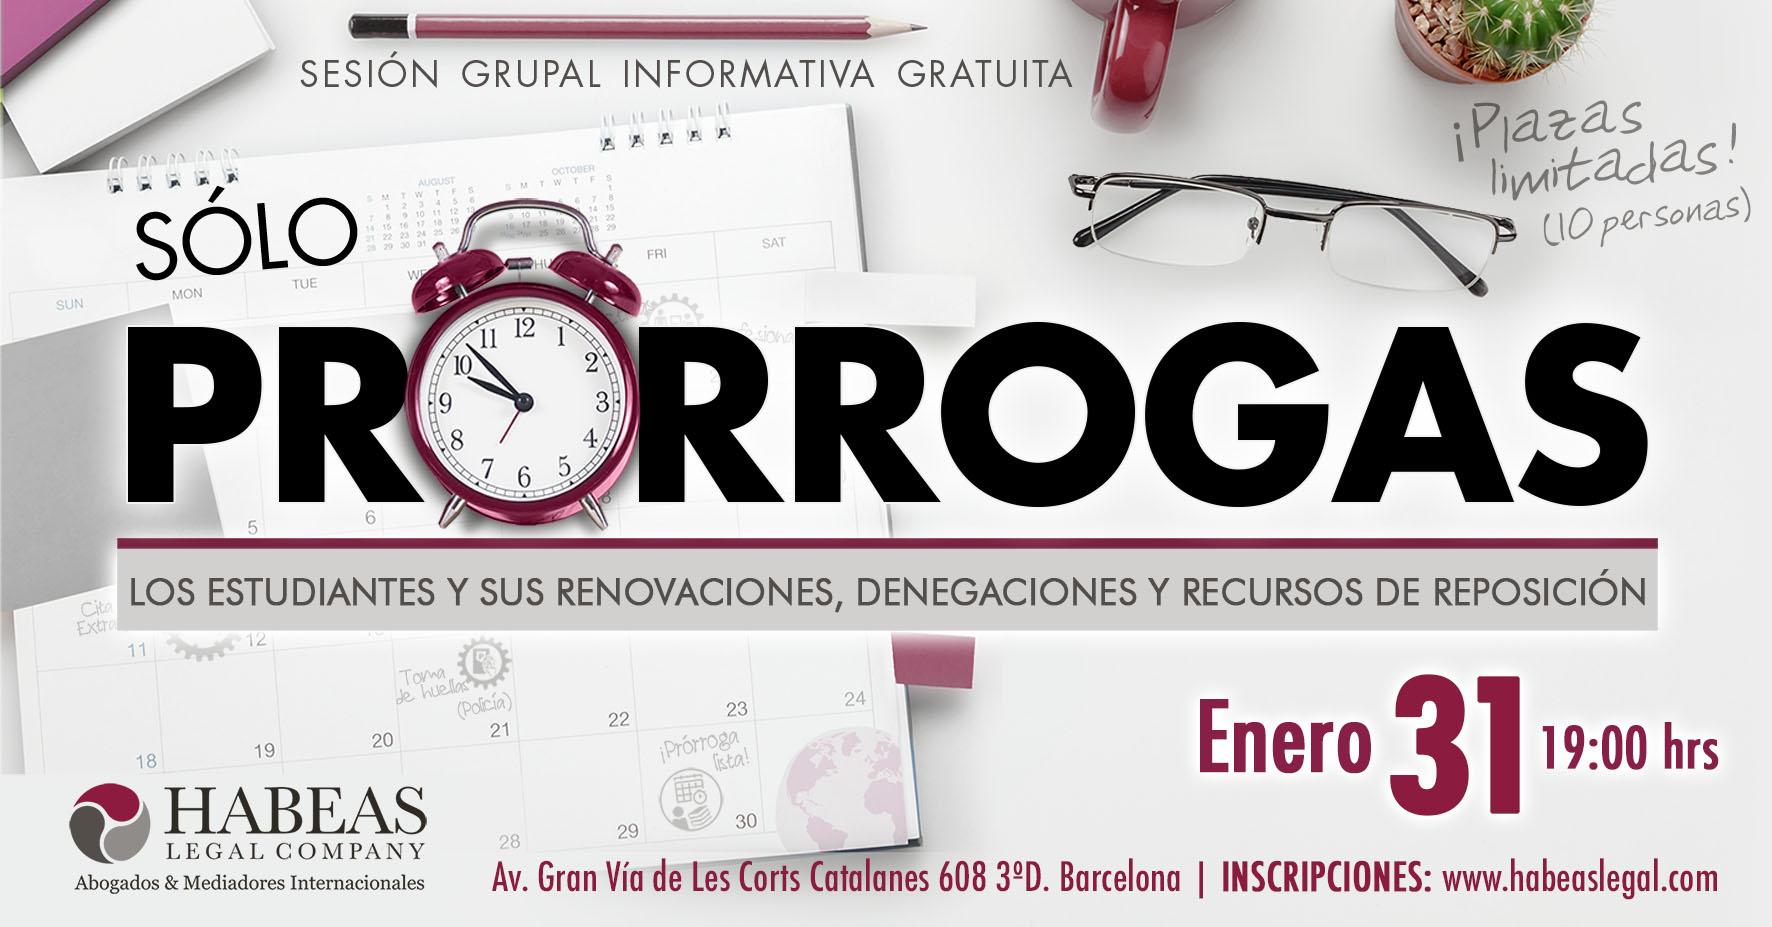 Prorrogas evento calendar ENE2019